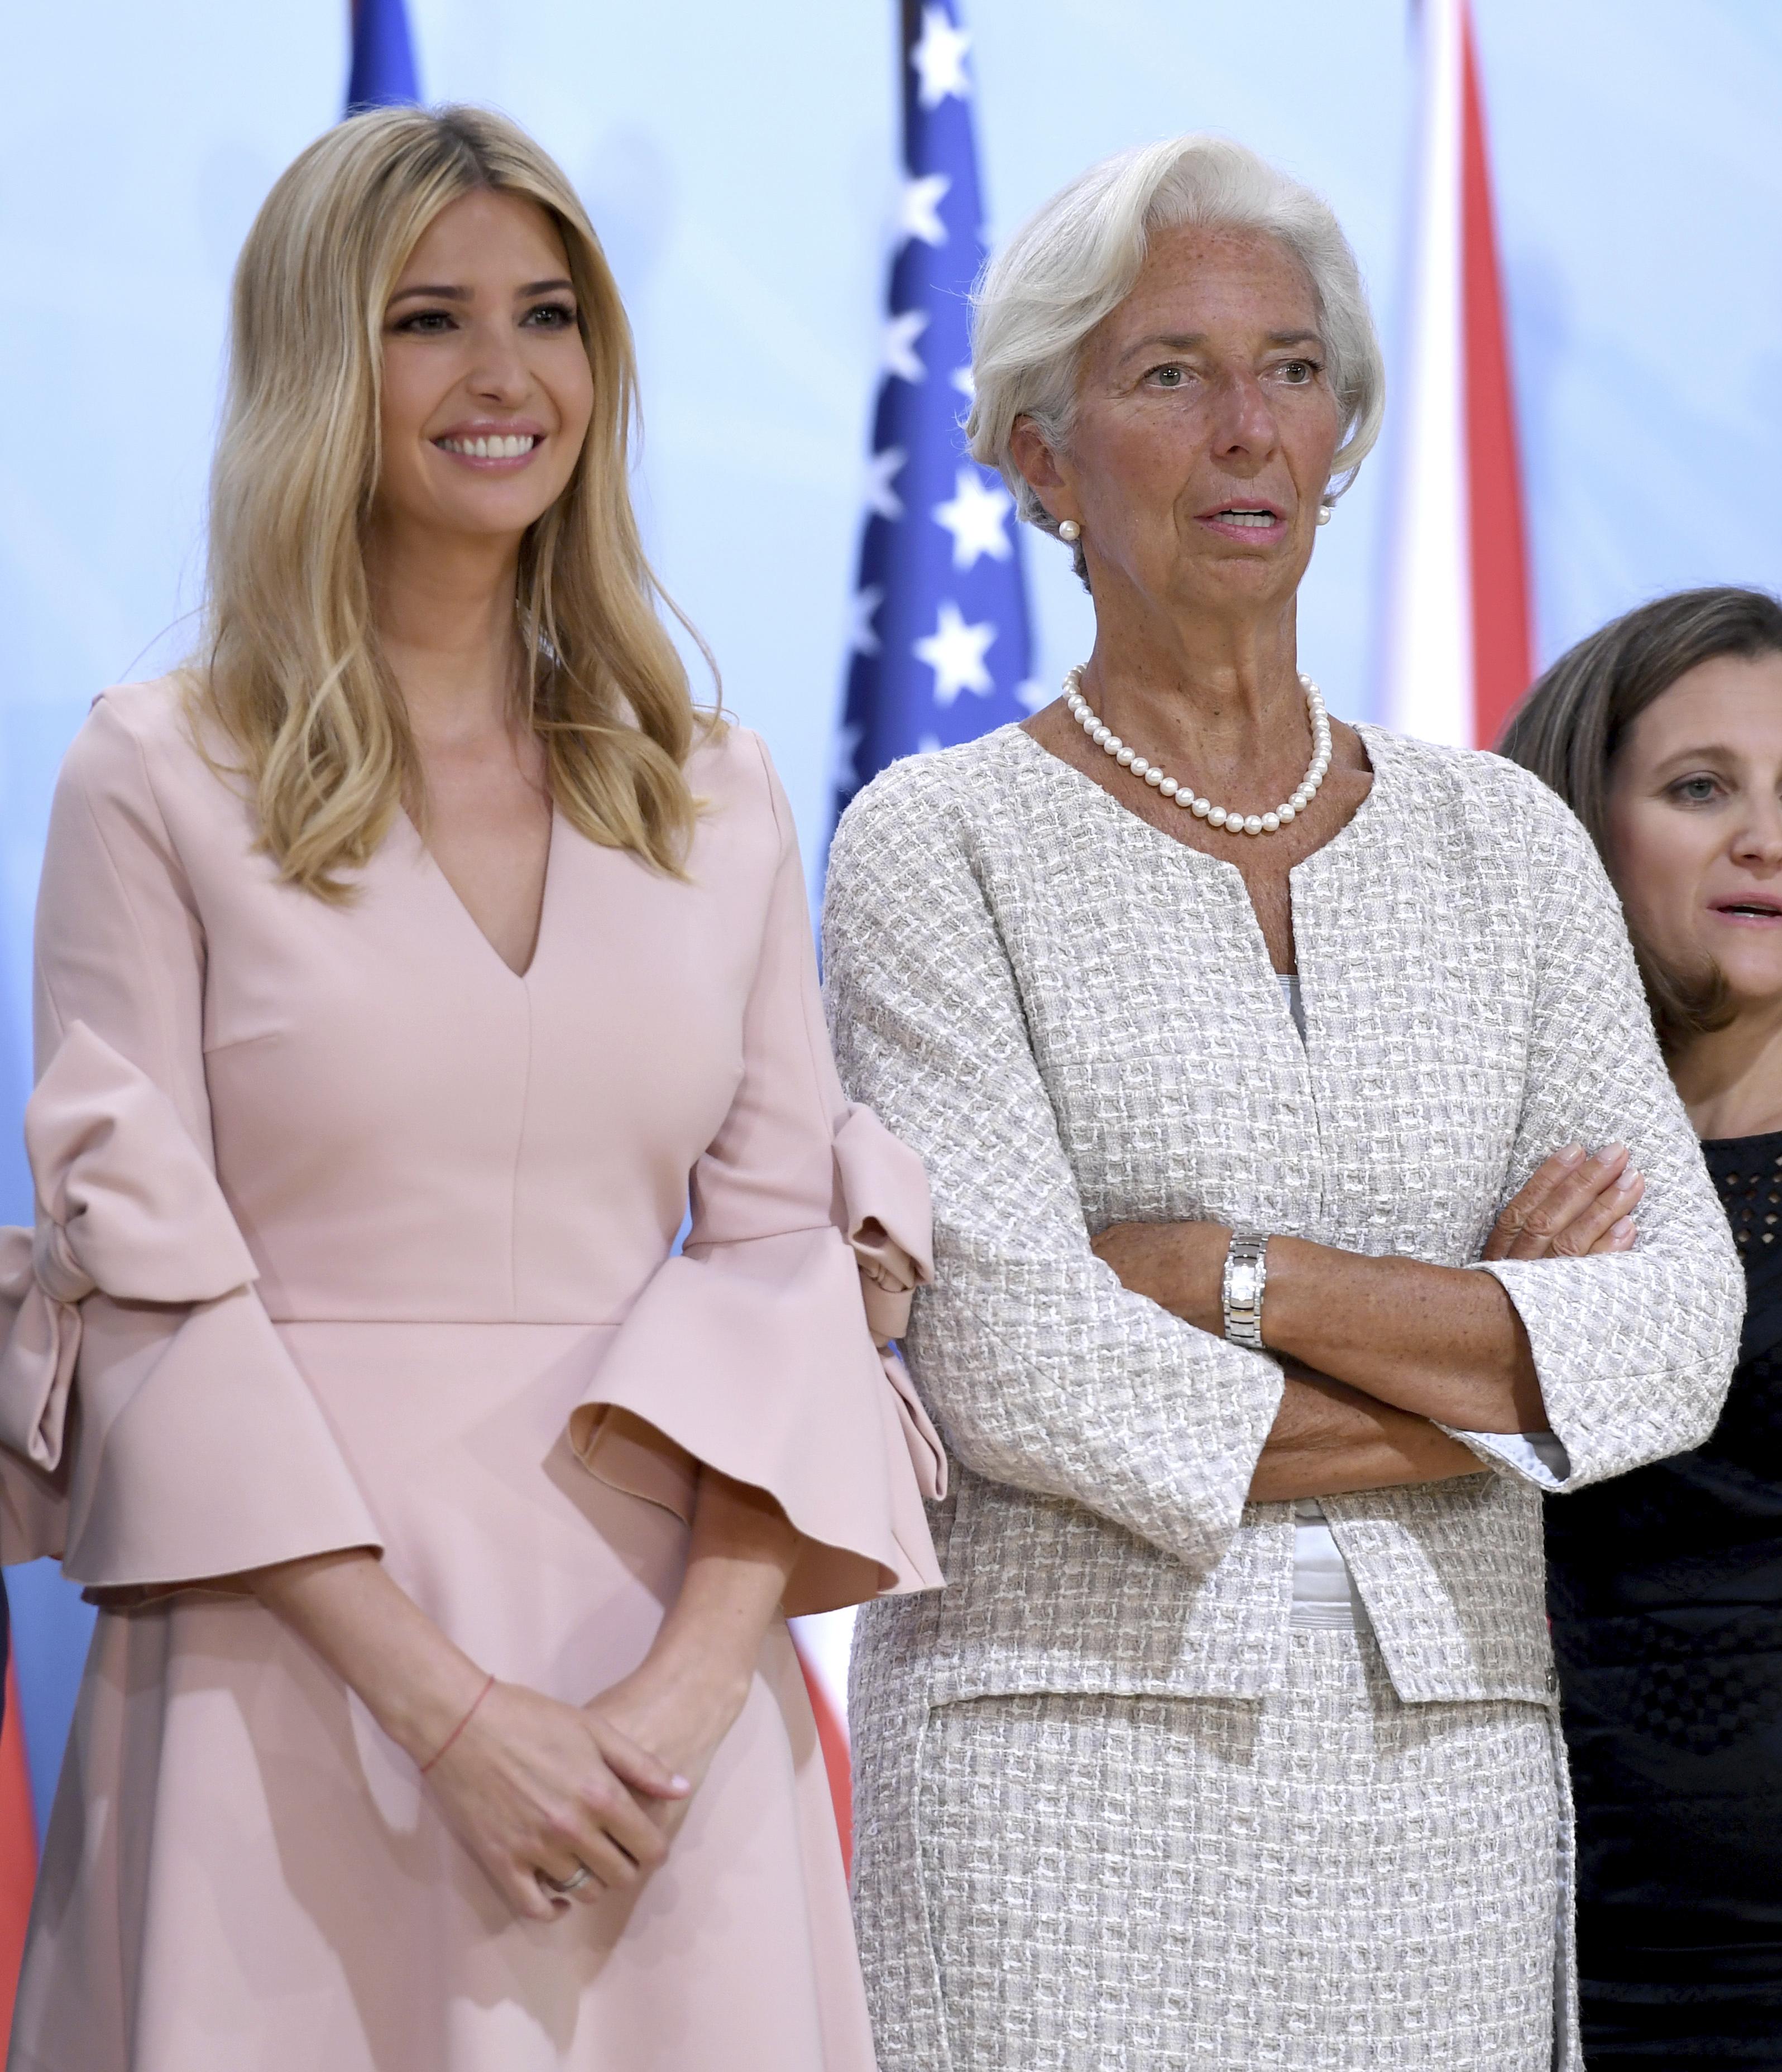 b6a7c1bef9b12 Joan Walsh slams Ivanka Trump's 'girlie' G-20 attire: 'Not a dress that's  made for work' - Washington Times